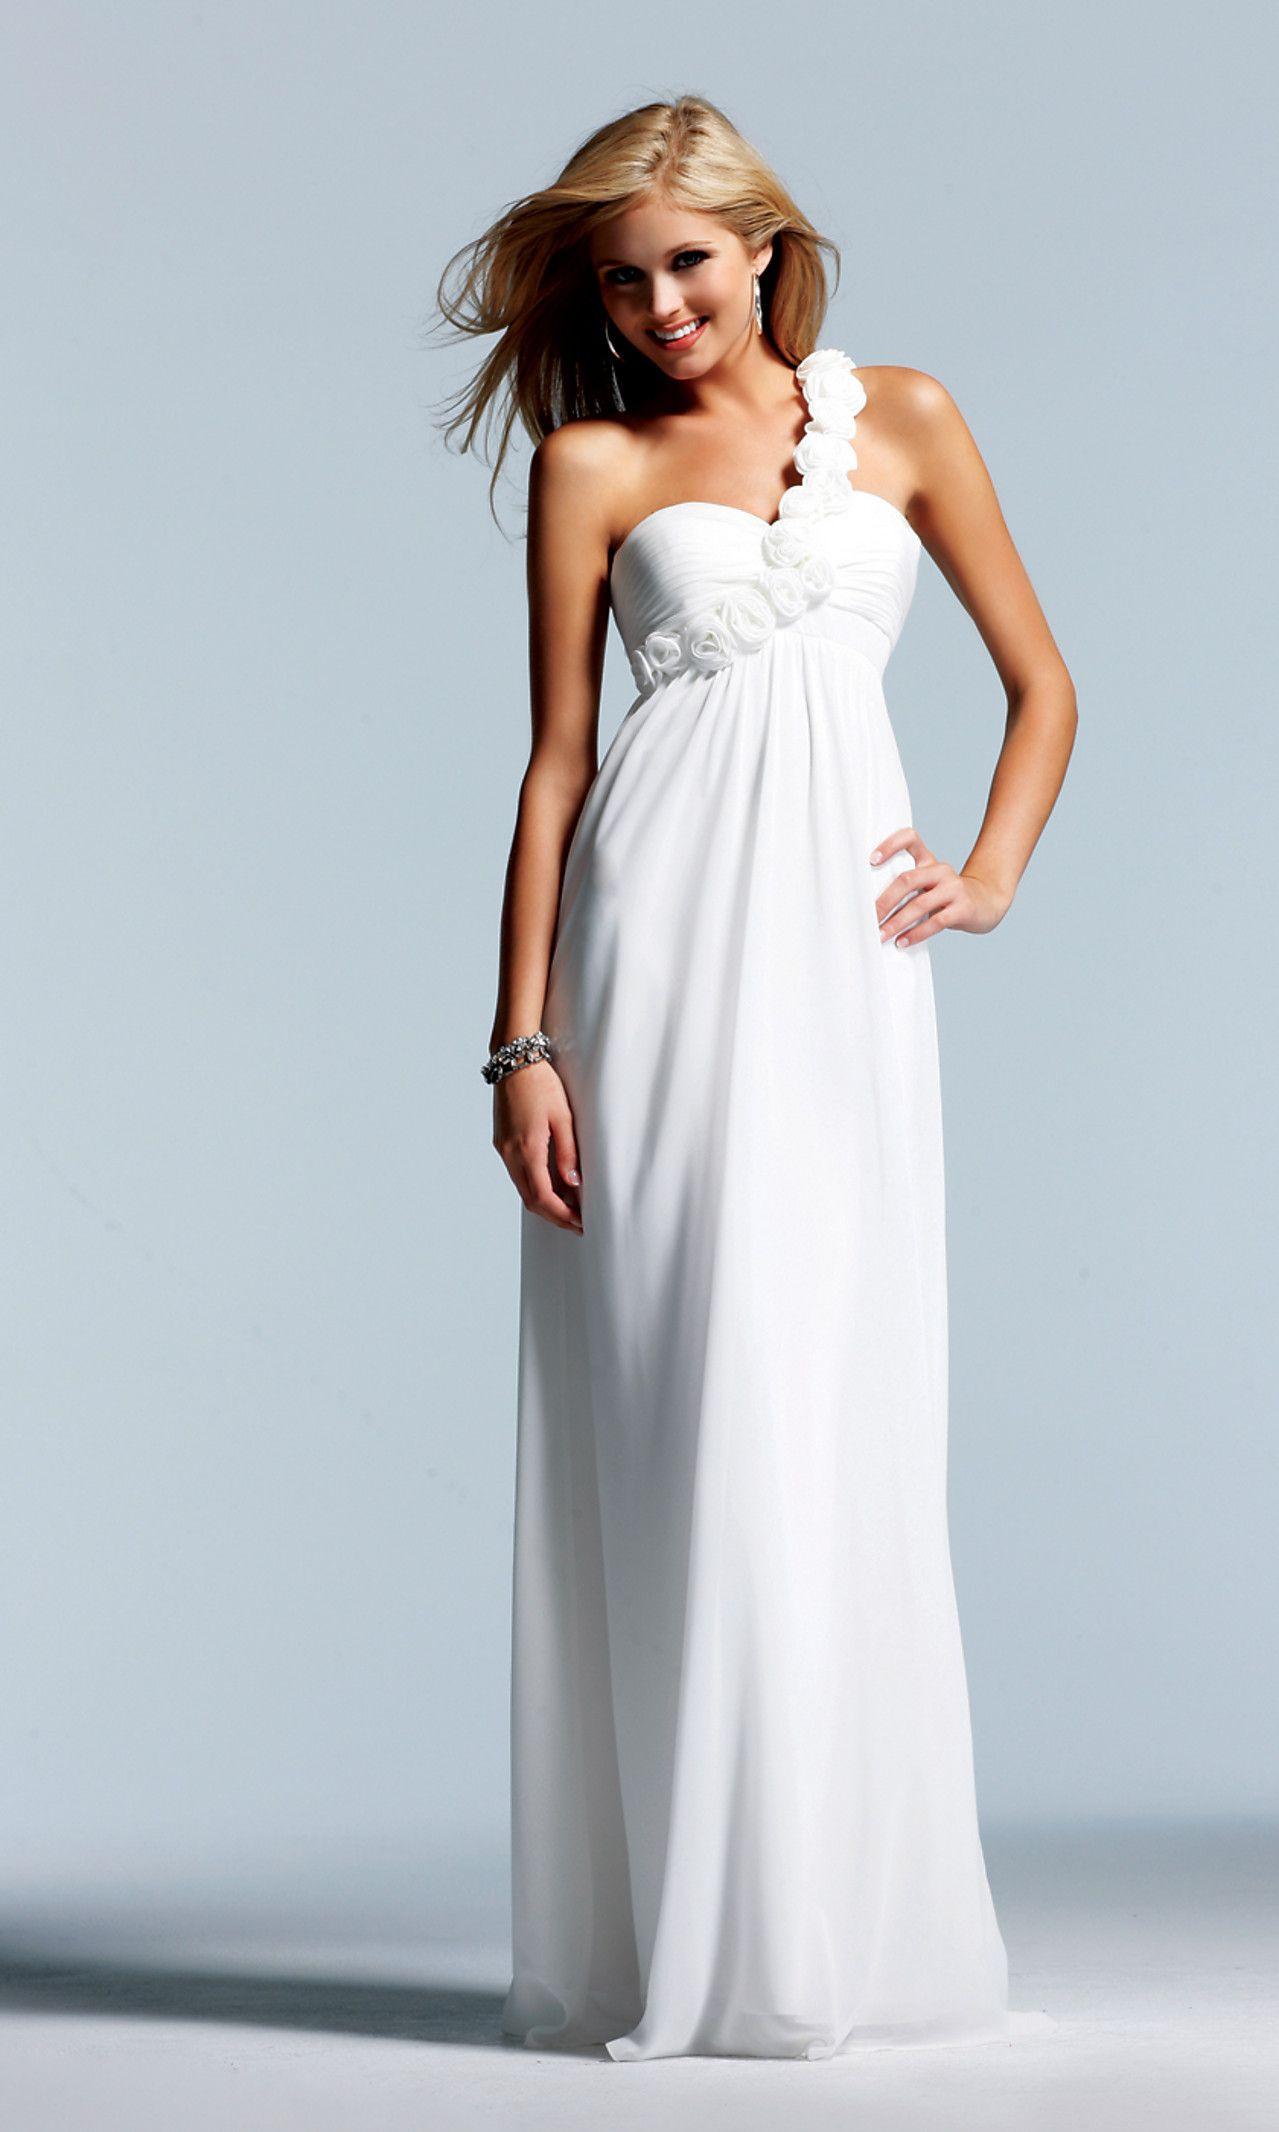 Vow Wedding Dress  Vow renewal dress Weddings Pinterest